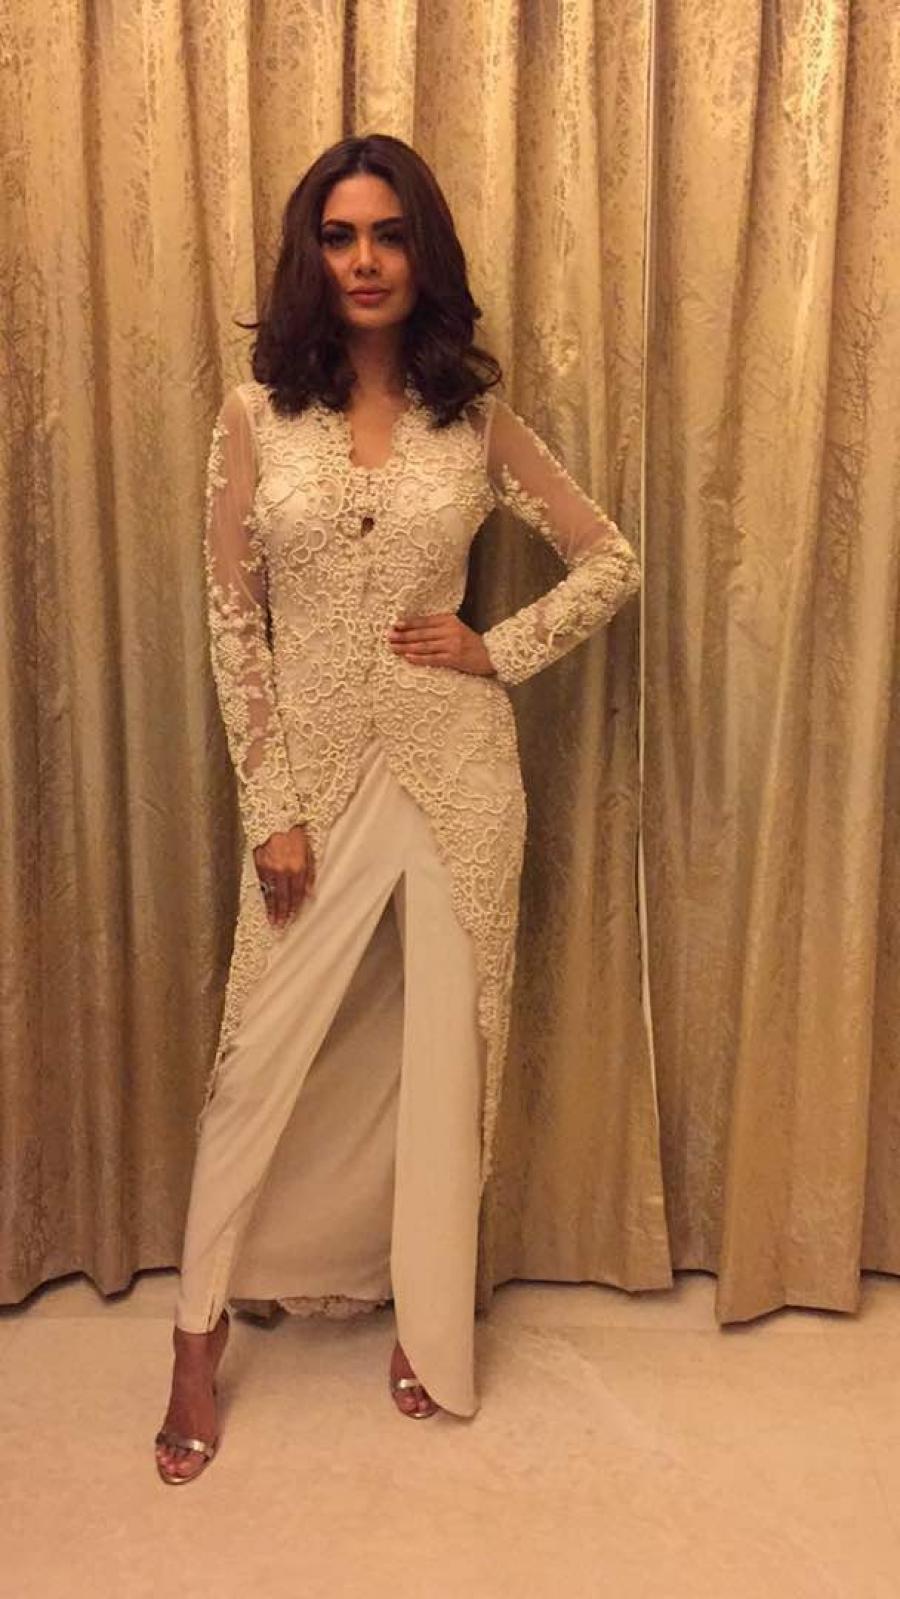 Hindi Girl In White Dress Mumbai Esha Gupta  at the Cama Awards